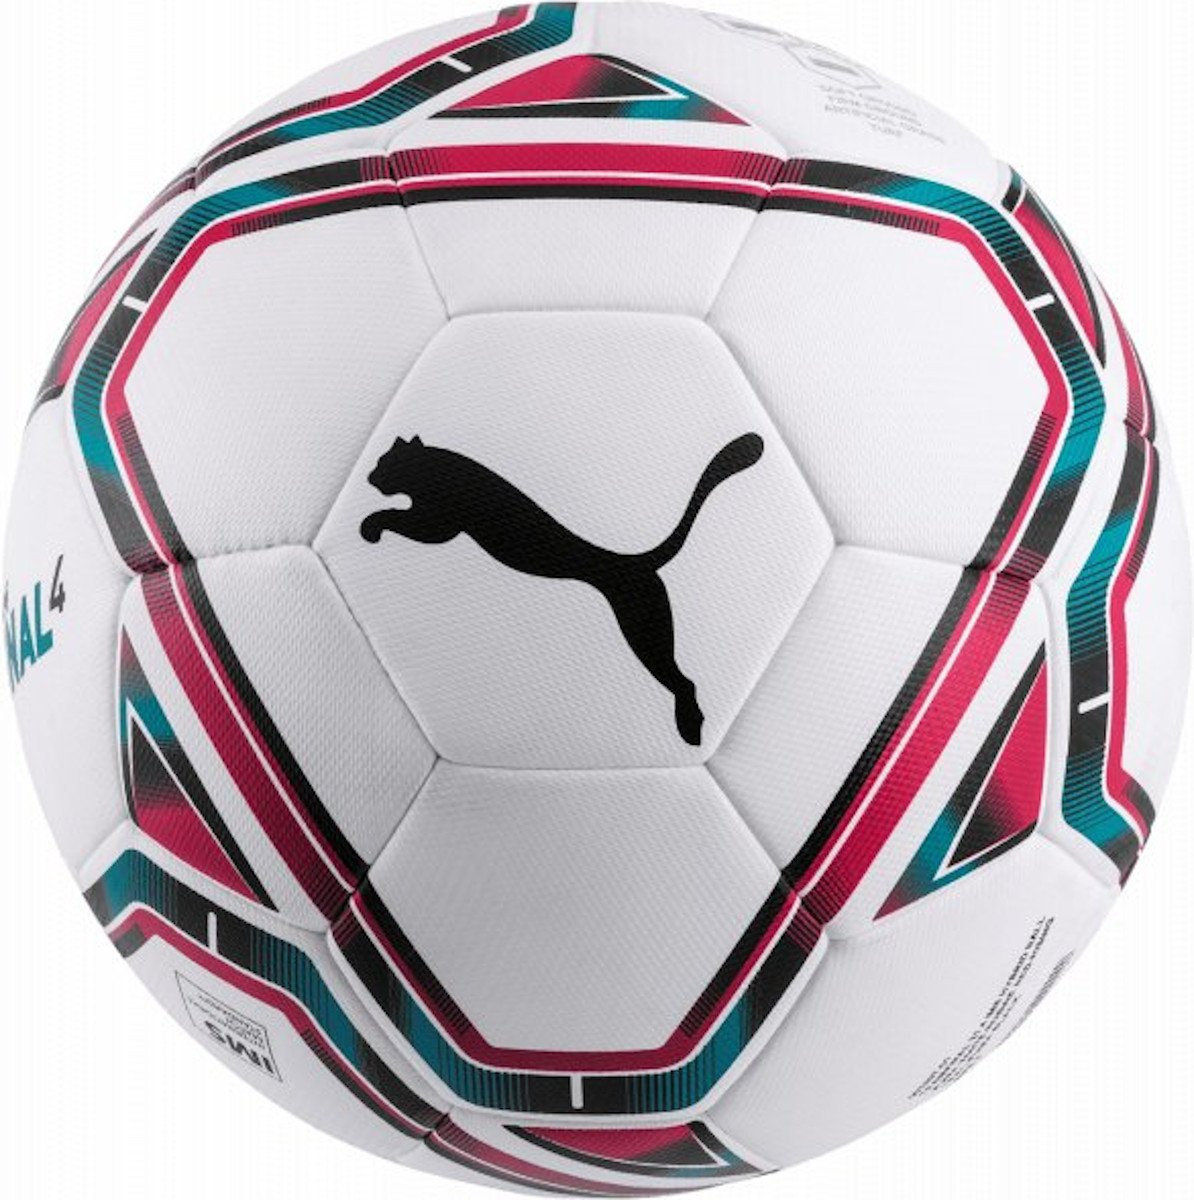 Míč Puma teamFINAL 21.4. IMS Hybrid Ball